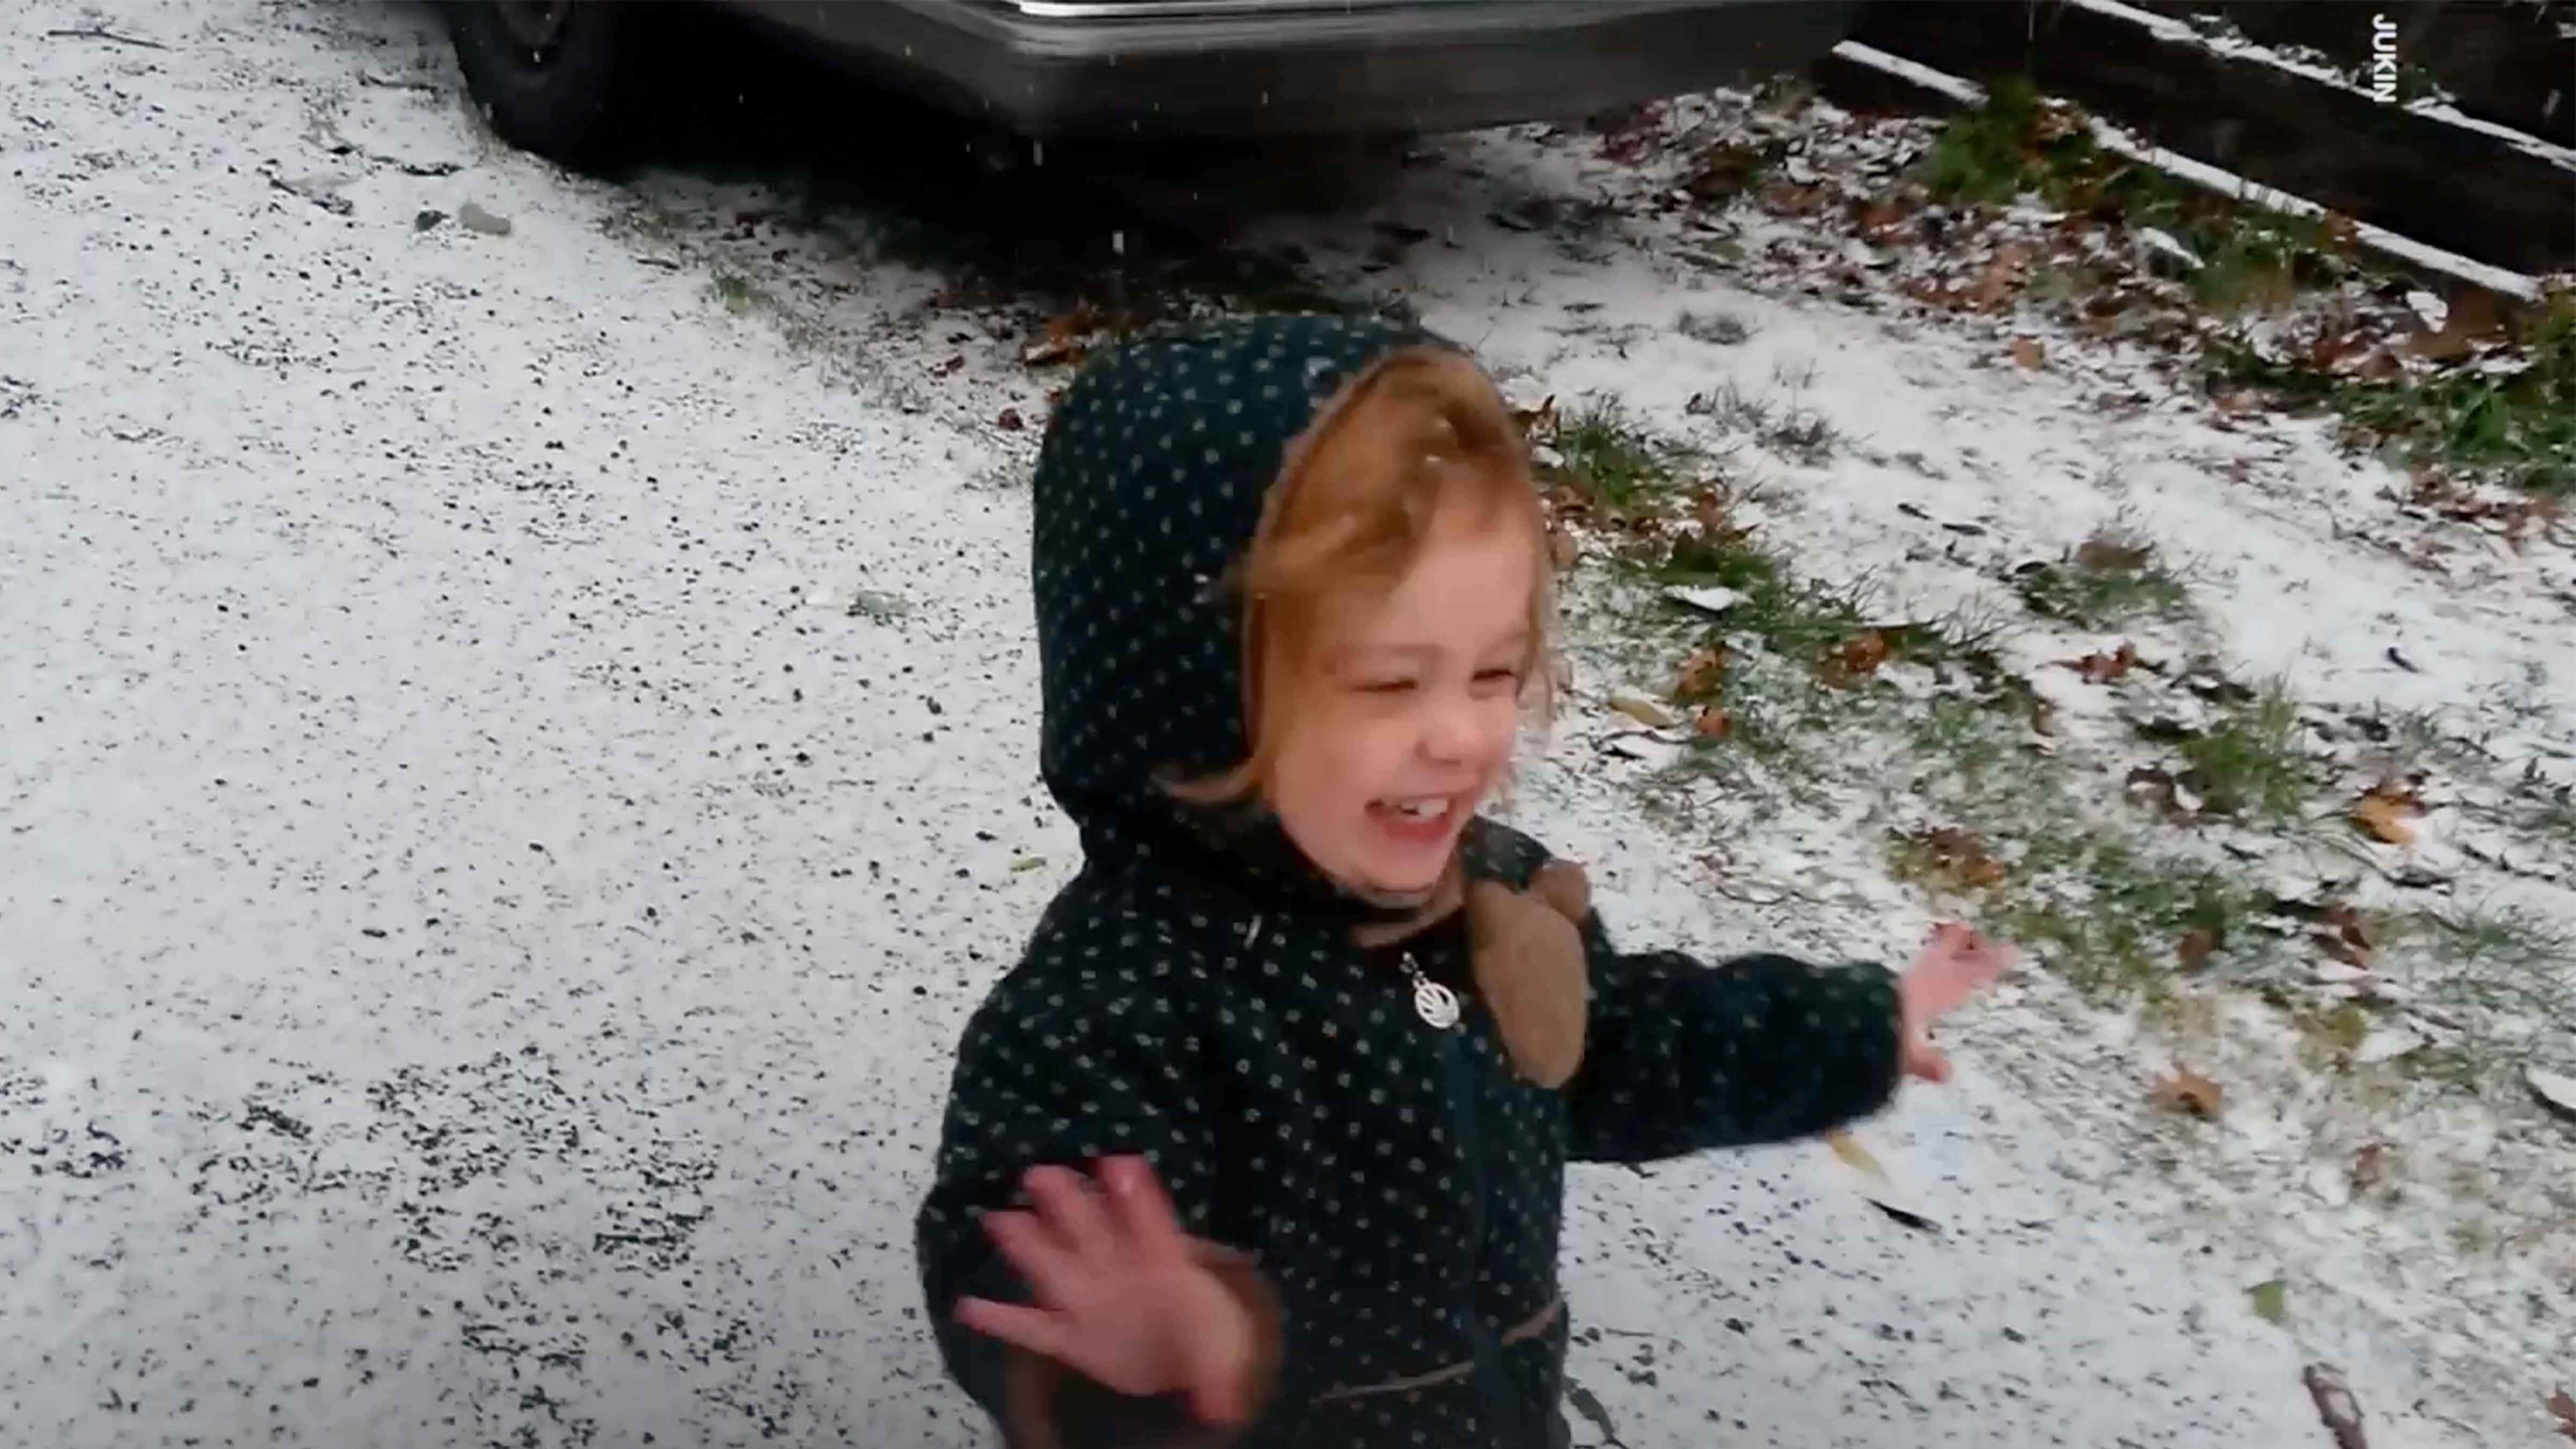 The Old Farmer's Almanac's Christmas Weather Forecast Calls for Snow Across the U.S.